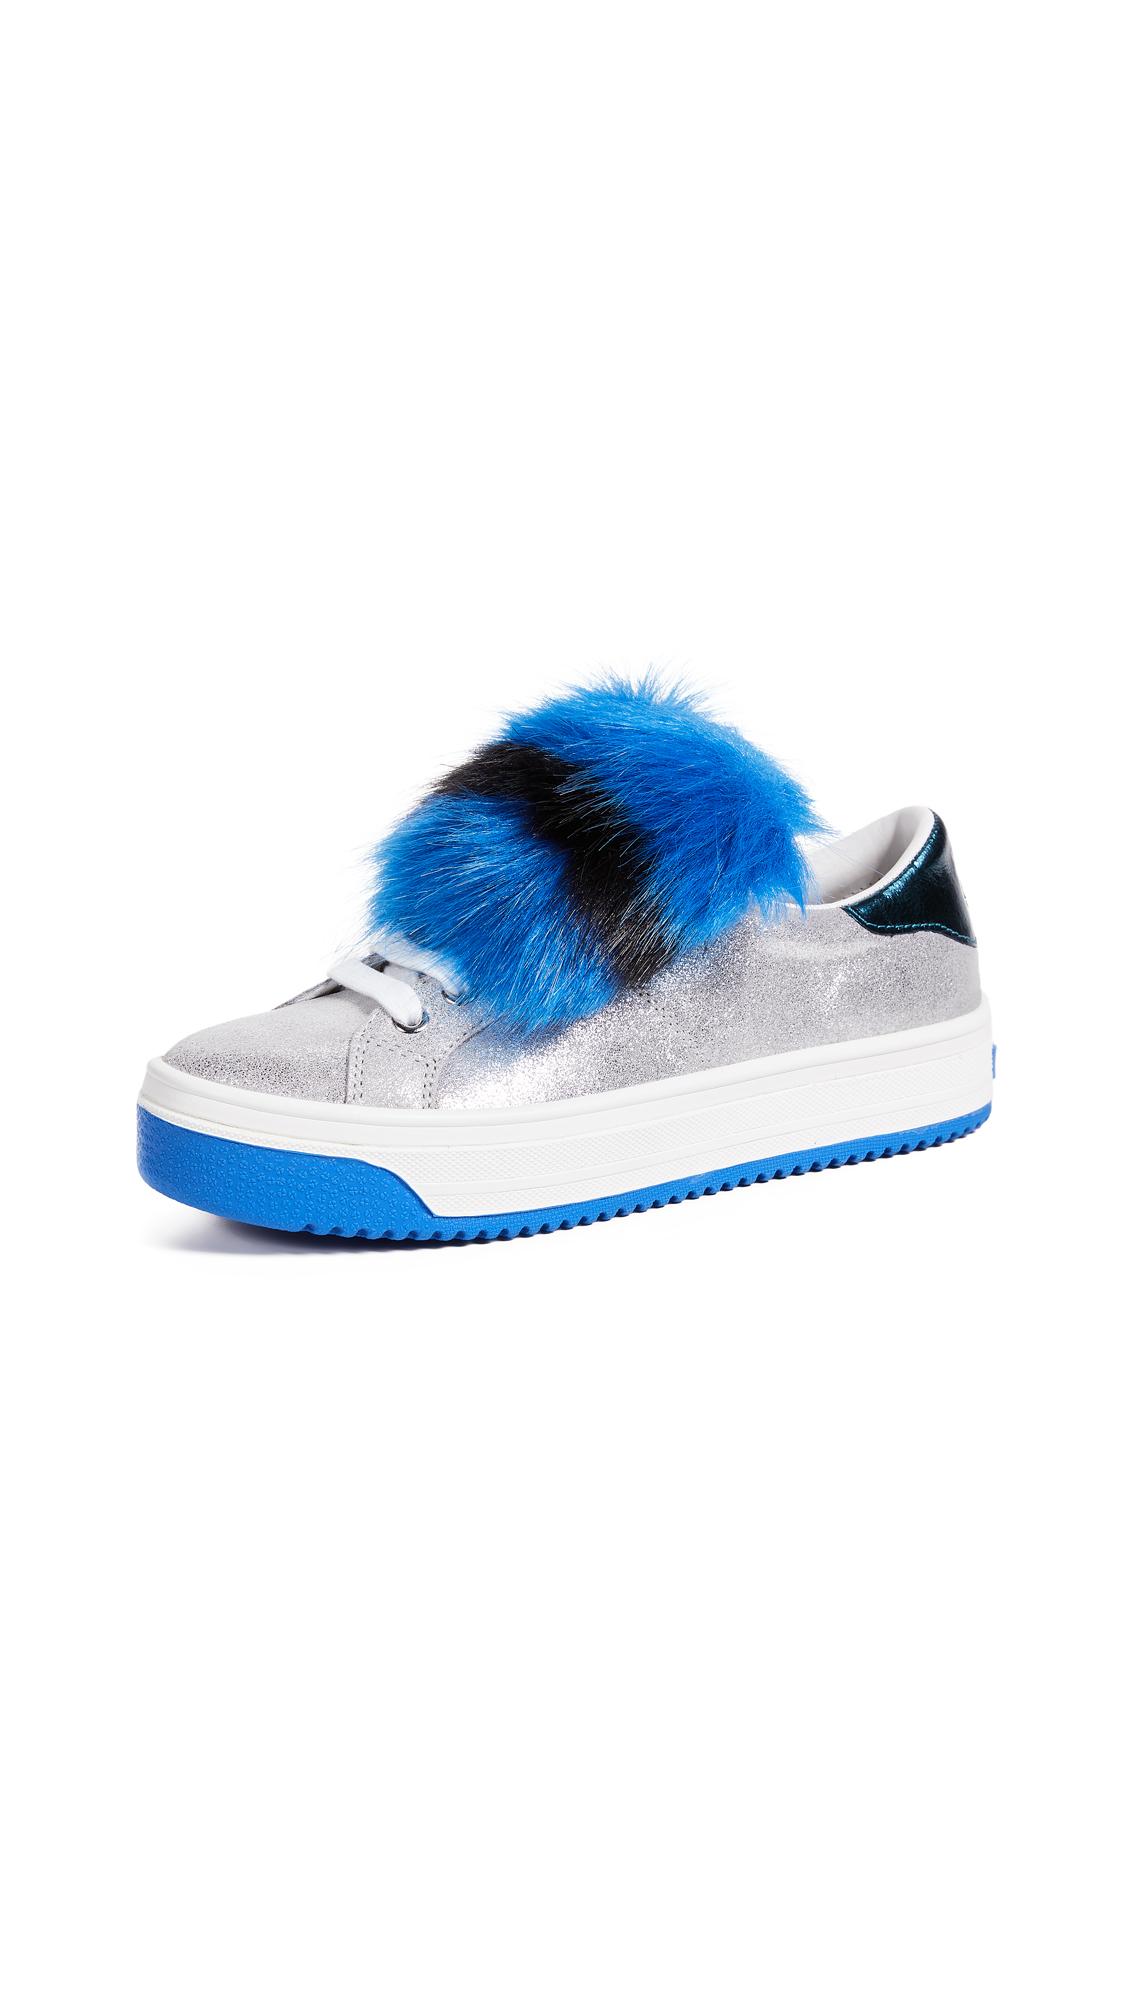 Marc Jacobs Empire Multicolor Sole Sneakers - Silver Multi